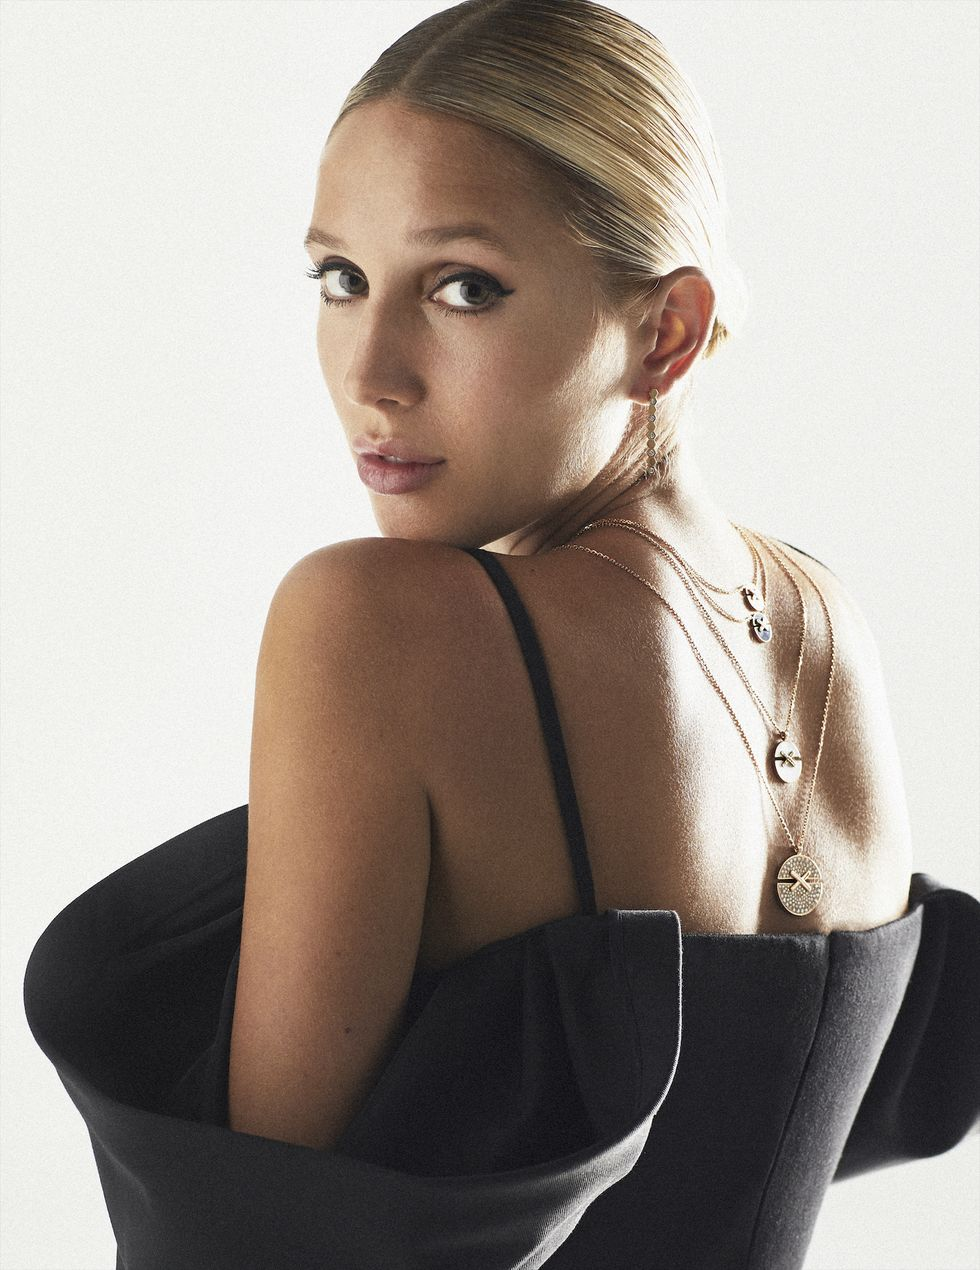 Мария-Олимпия снялась для испанского Harper's BAZAAR https://hips.hearstapps.com/hmg-prod.s3.amazonaws.com/images/1-200901-f07-1606-rgb-1602789423.jpg?resize=980:*